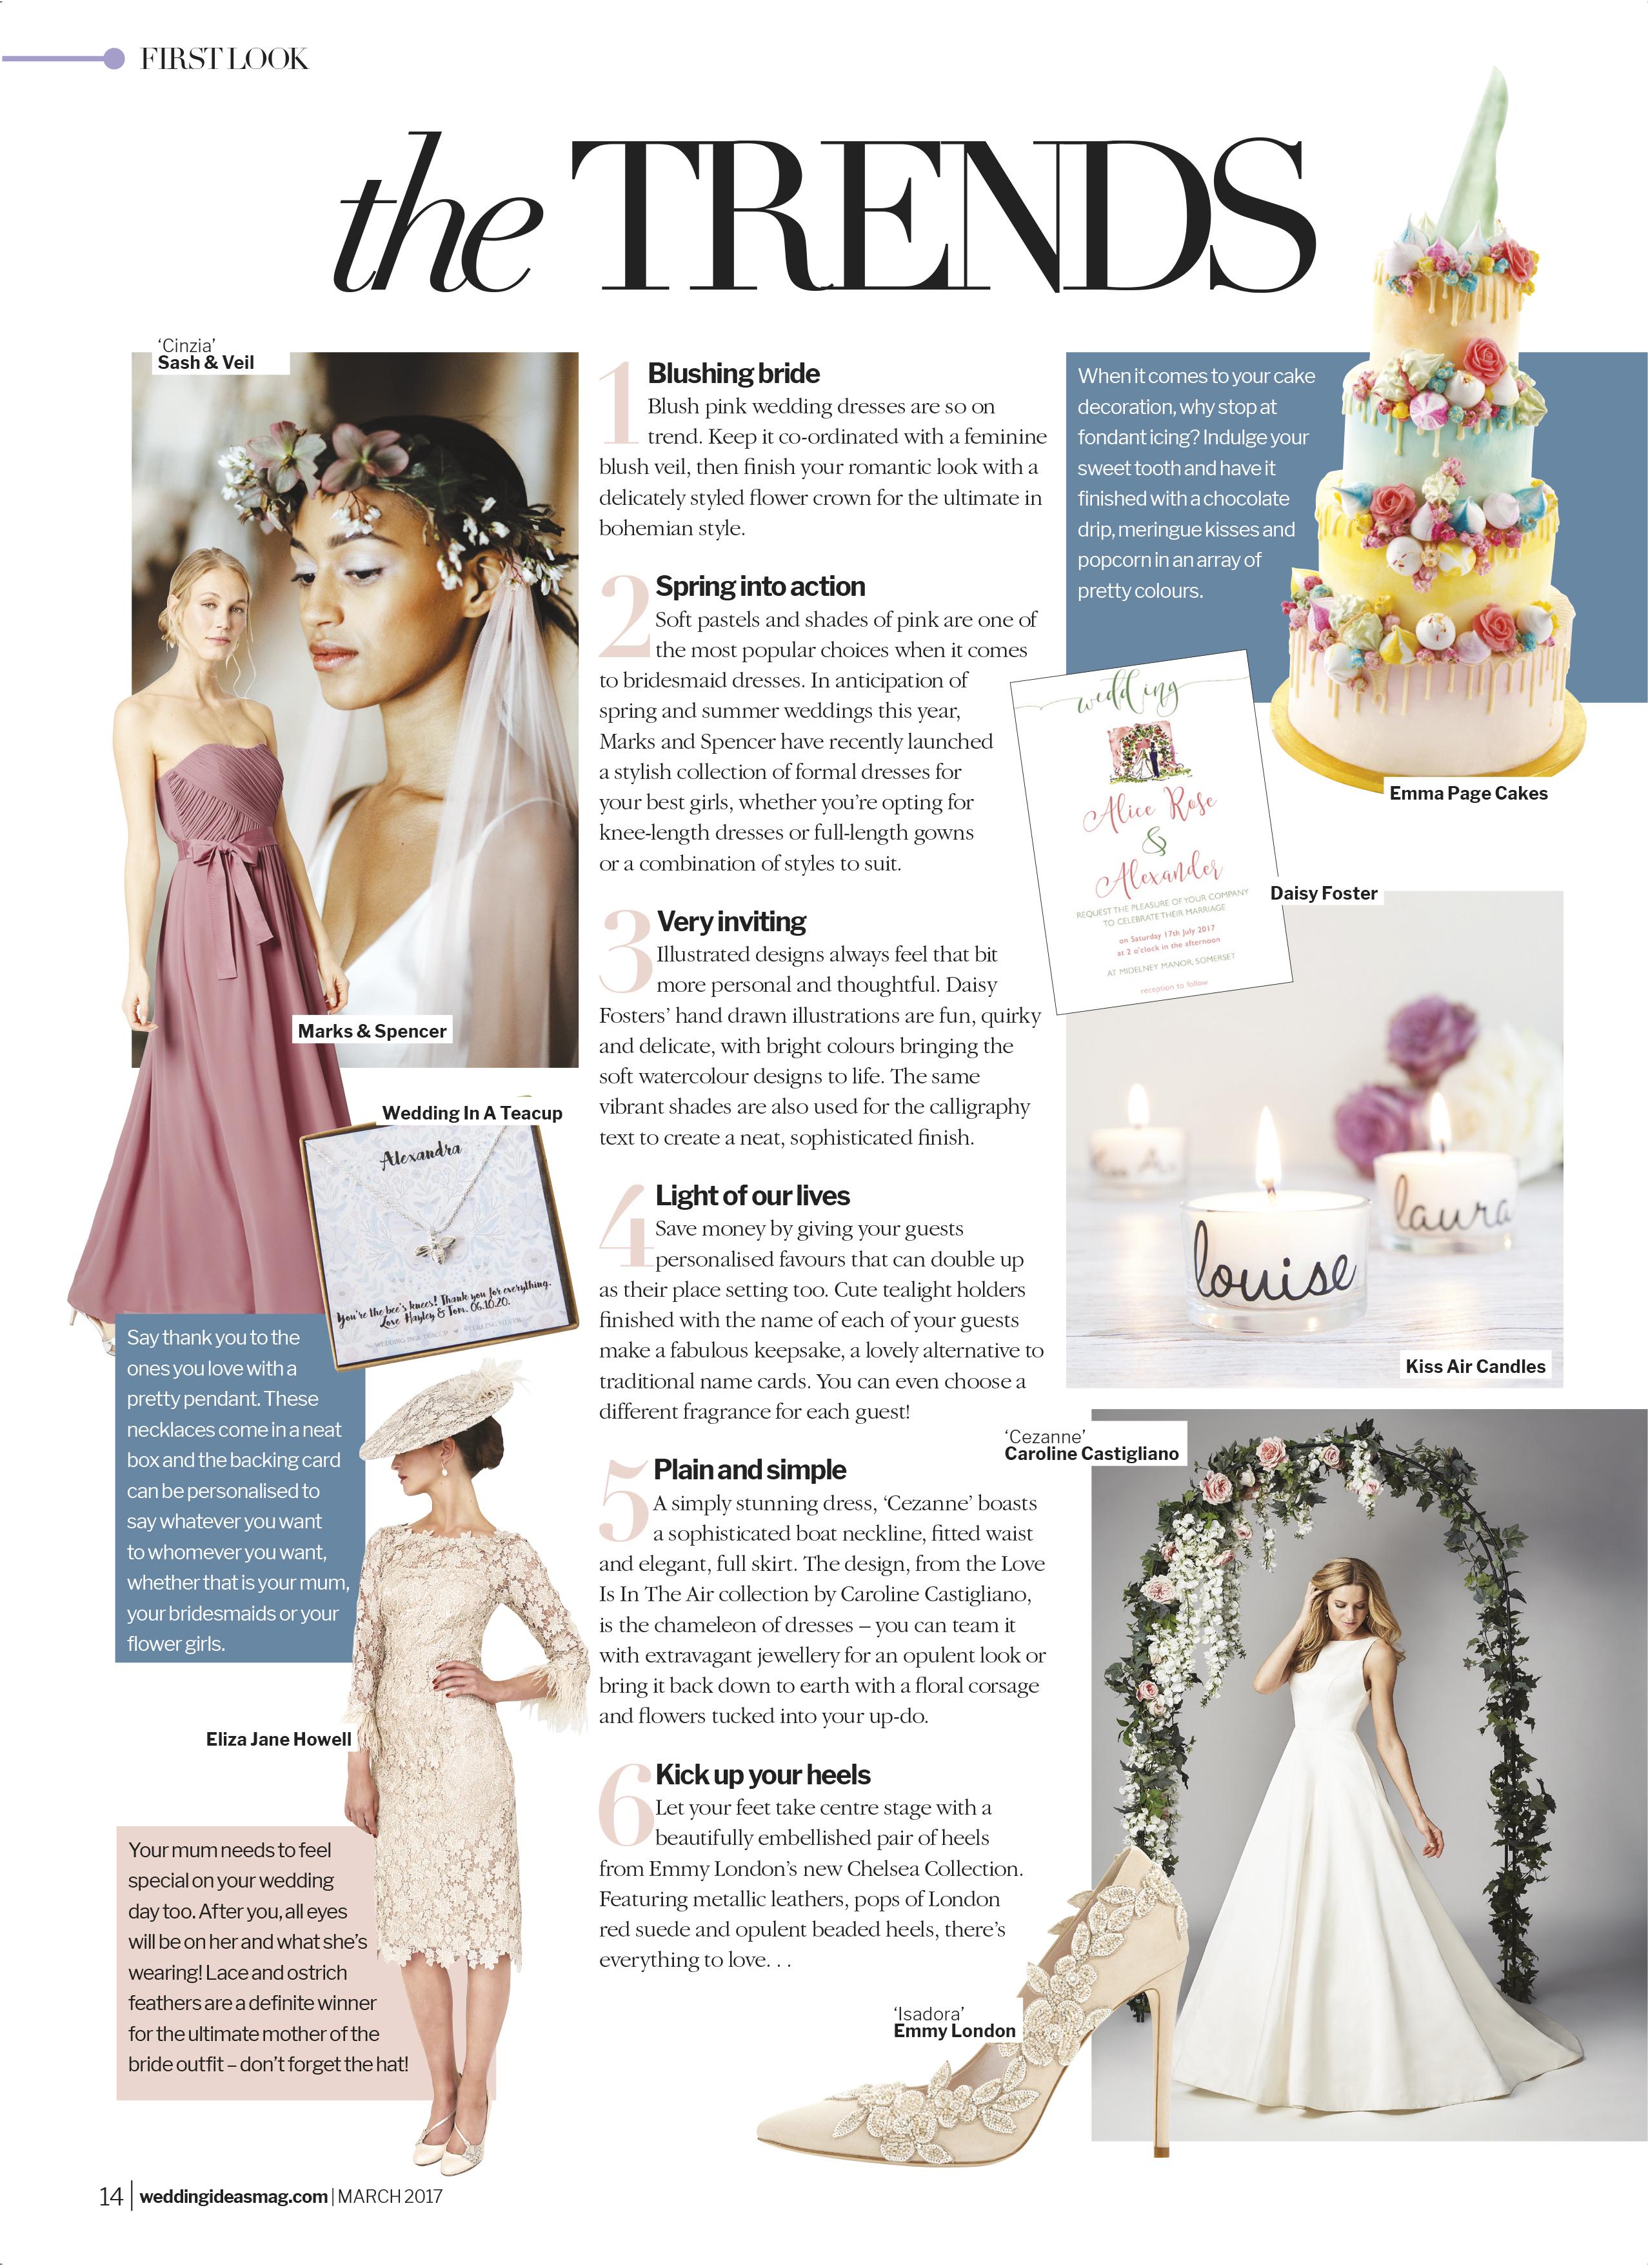 Wedding Ideas Cezanne designer wedding gown by Caroline Castigliano